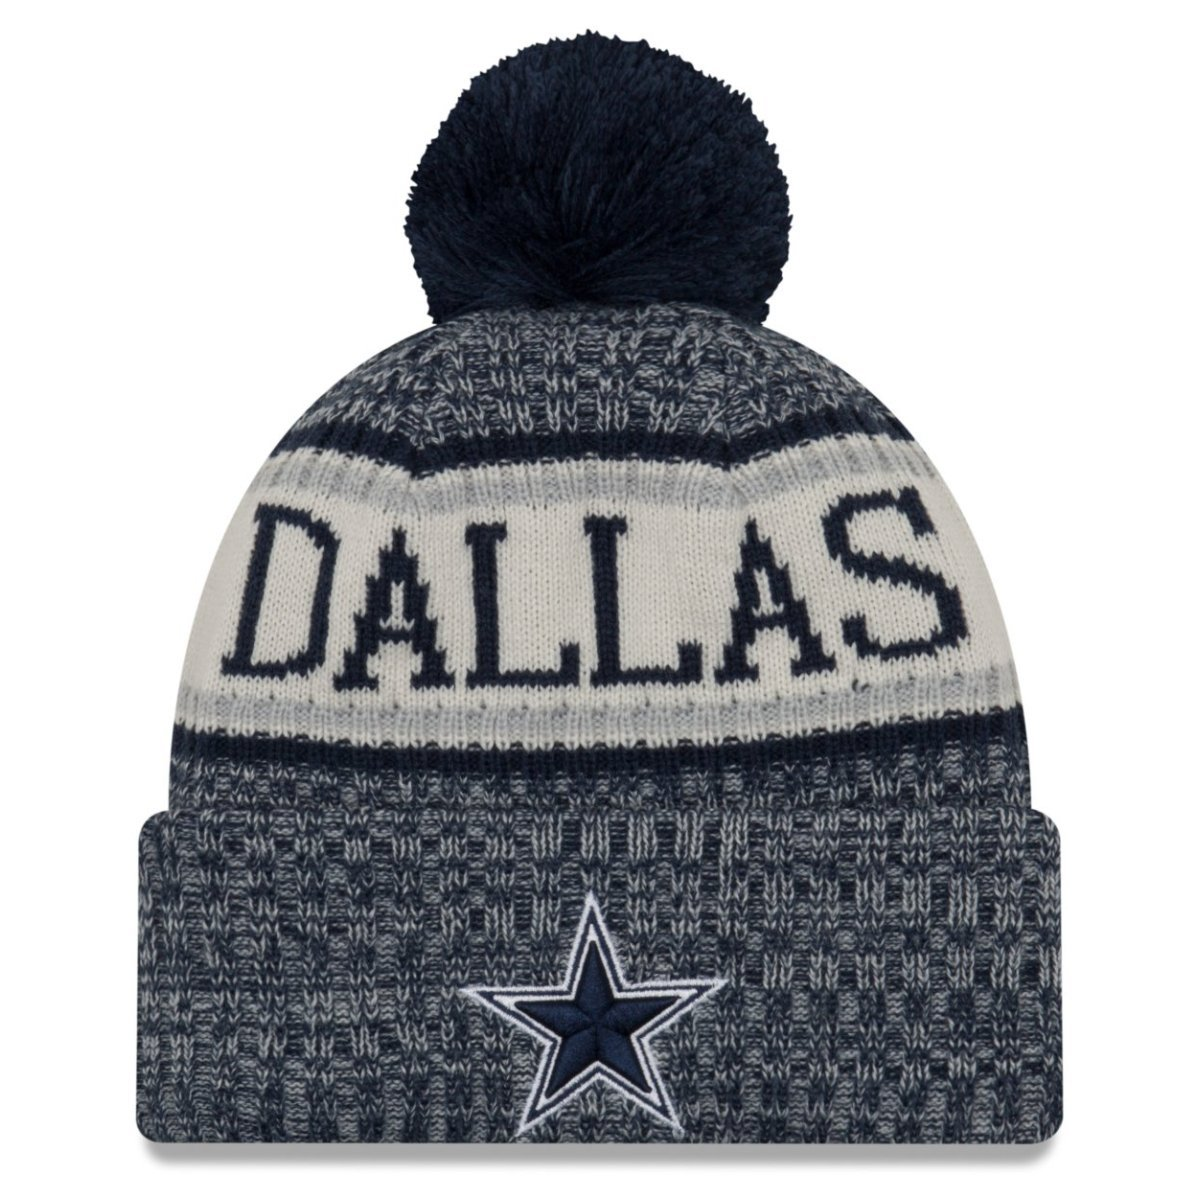 New Era NFL Sideline 2018 Bobble Mütze - Dallas Cowboys | eBay